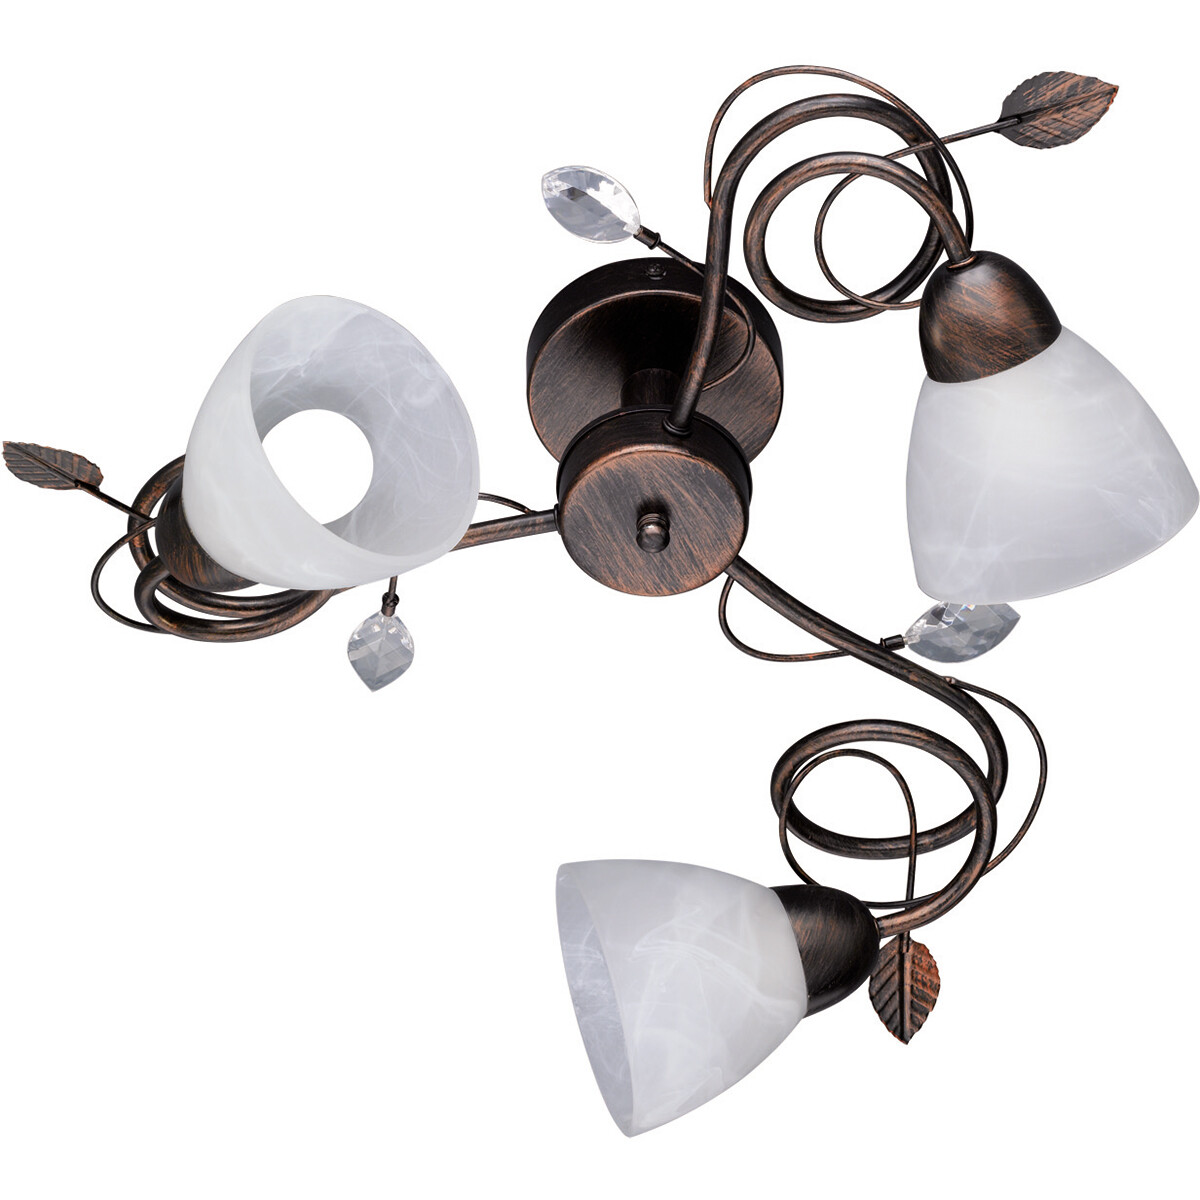 LED Plafondlamp - Plafondverlichting - Trion Trada - E14 Fitting - 3-lichts - Rond - Antiek Roestkle